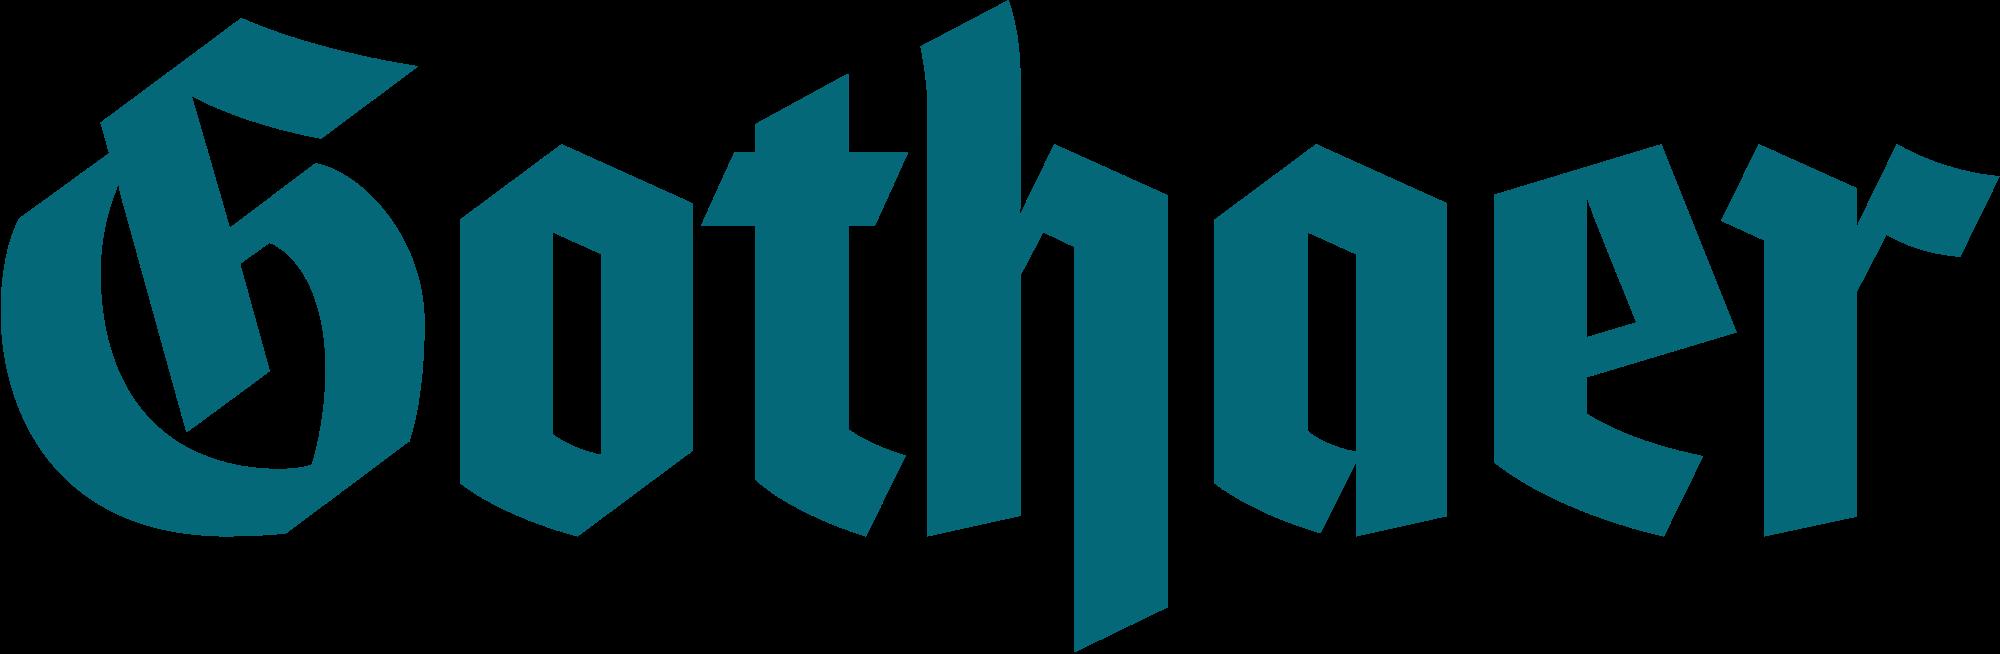 Gothaer Finanzholding AGLogo Image